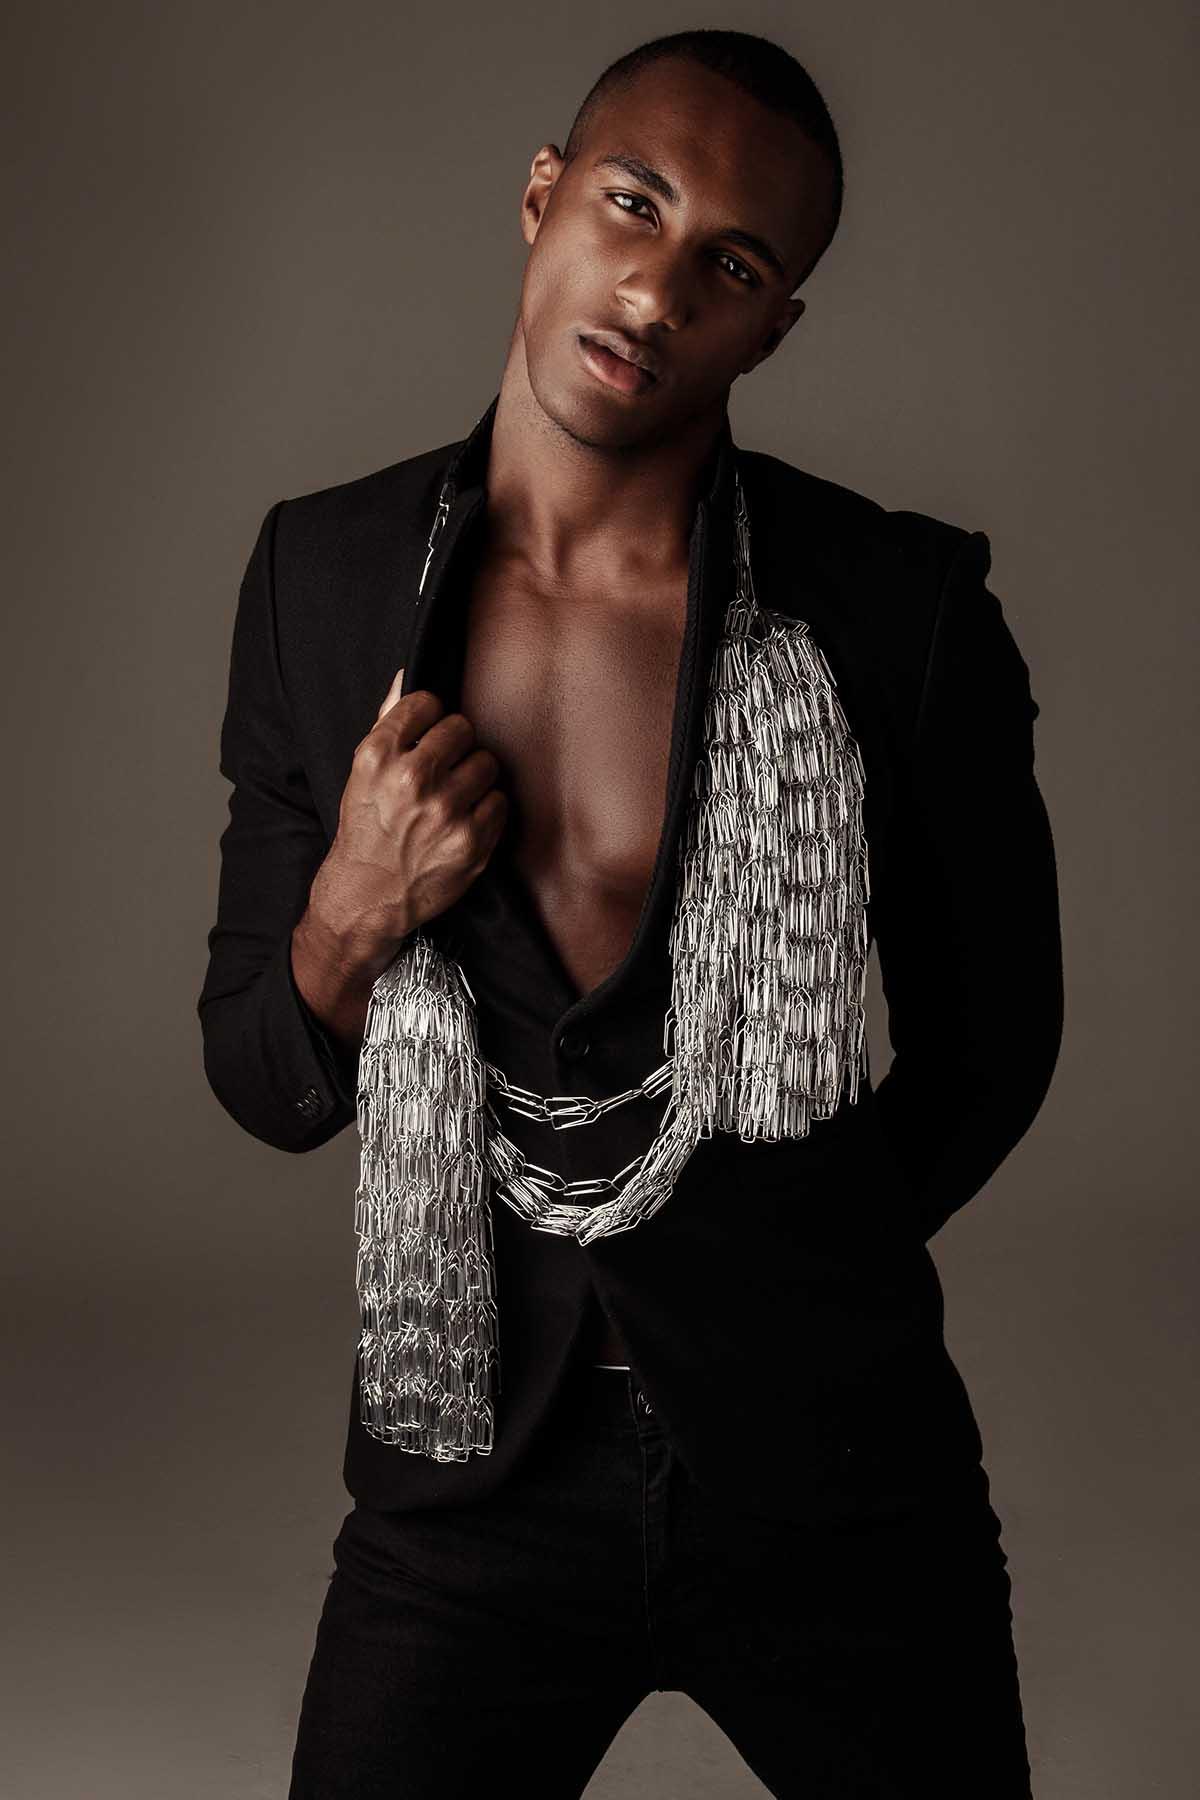 Joran Alcantara by Marcio Farias for Brazilian Male Model